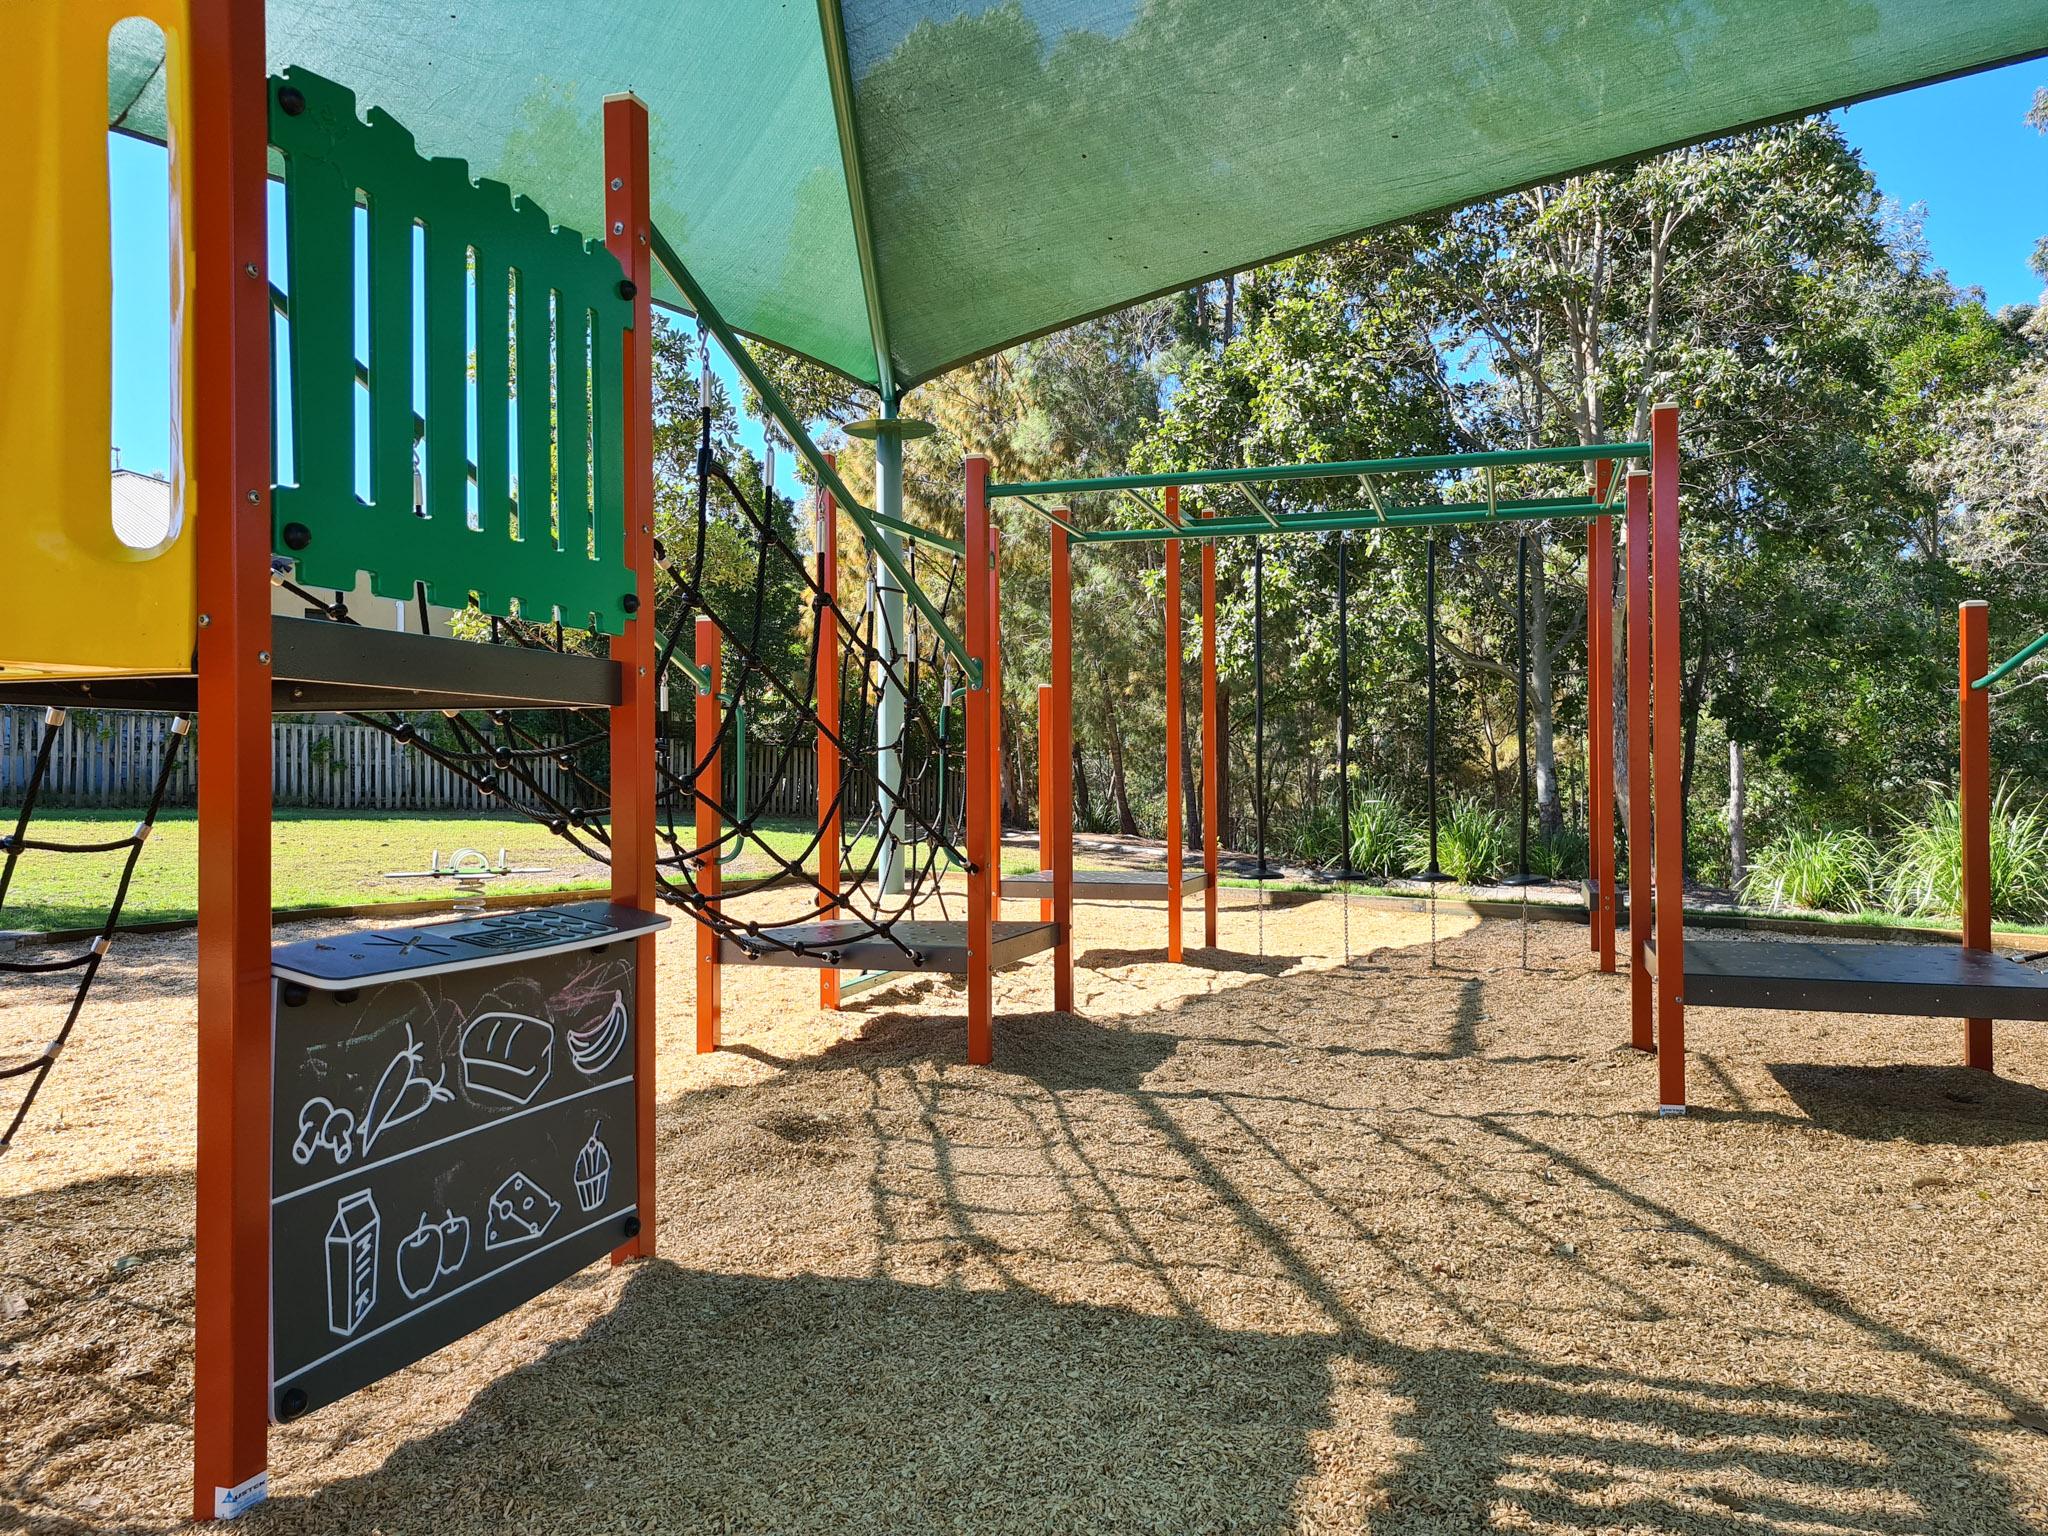 palm-beach-state-school-playrground-austek-play-54